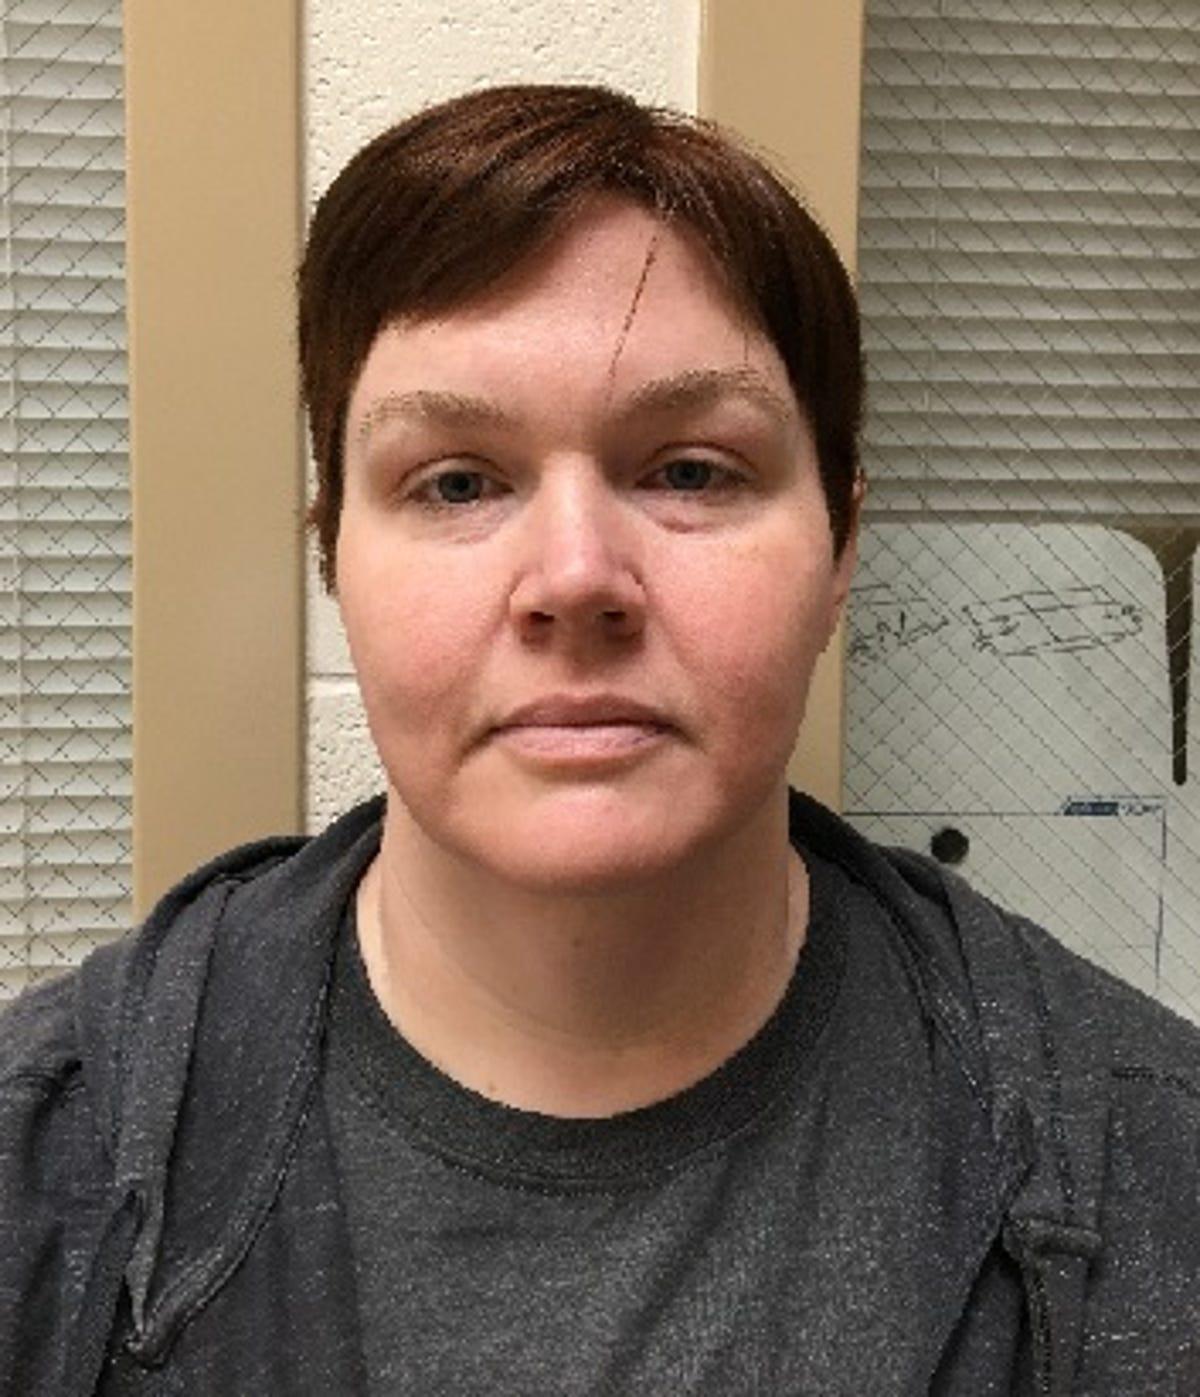 TBI: Sumner County Grand Jury returns indictments charging